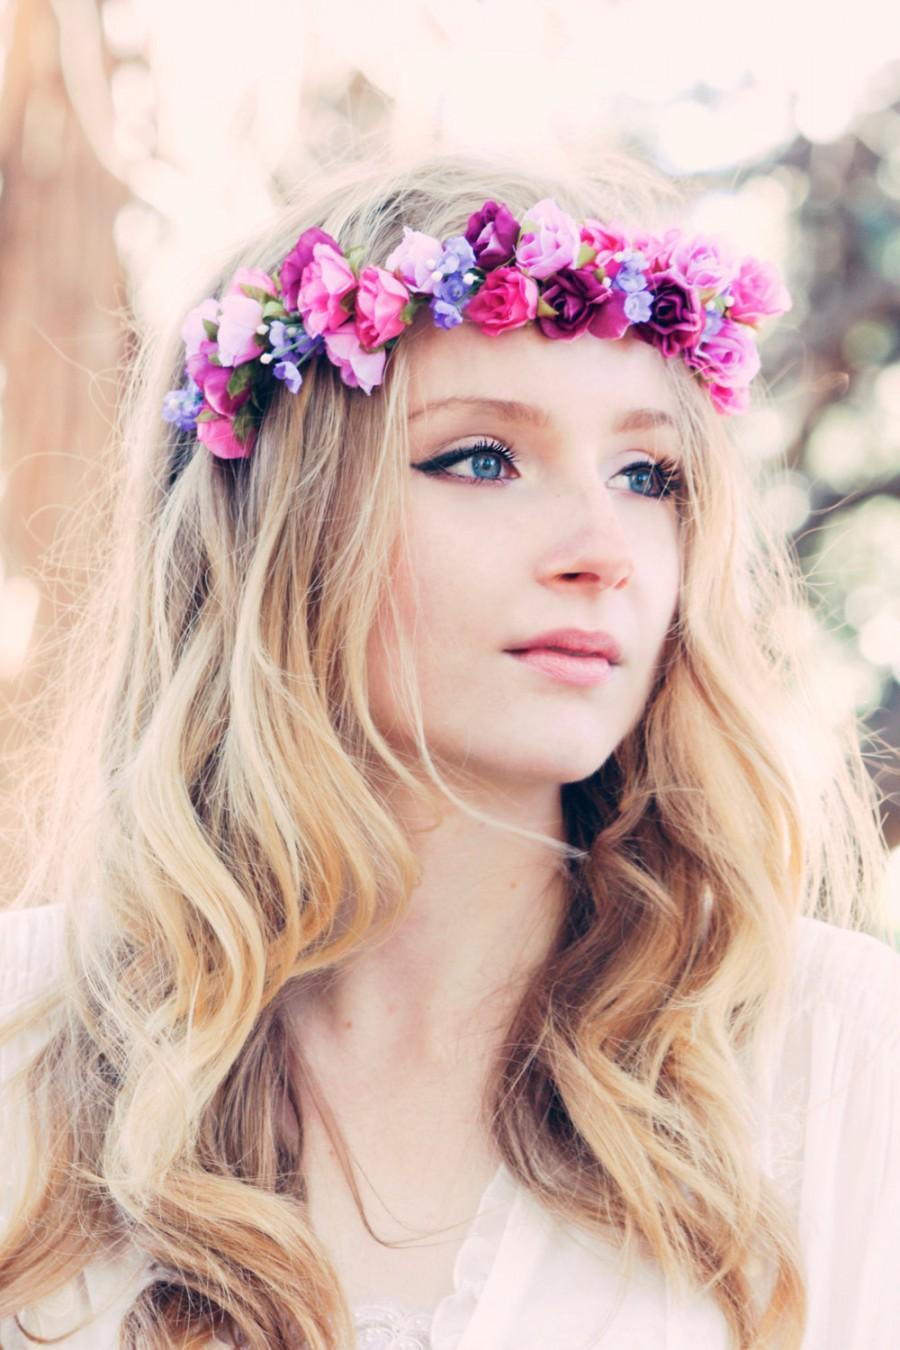 Wedding Flower Bridal Hair Accessory Roses Hair Wreath Headpiece